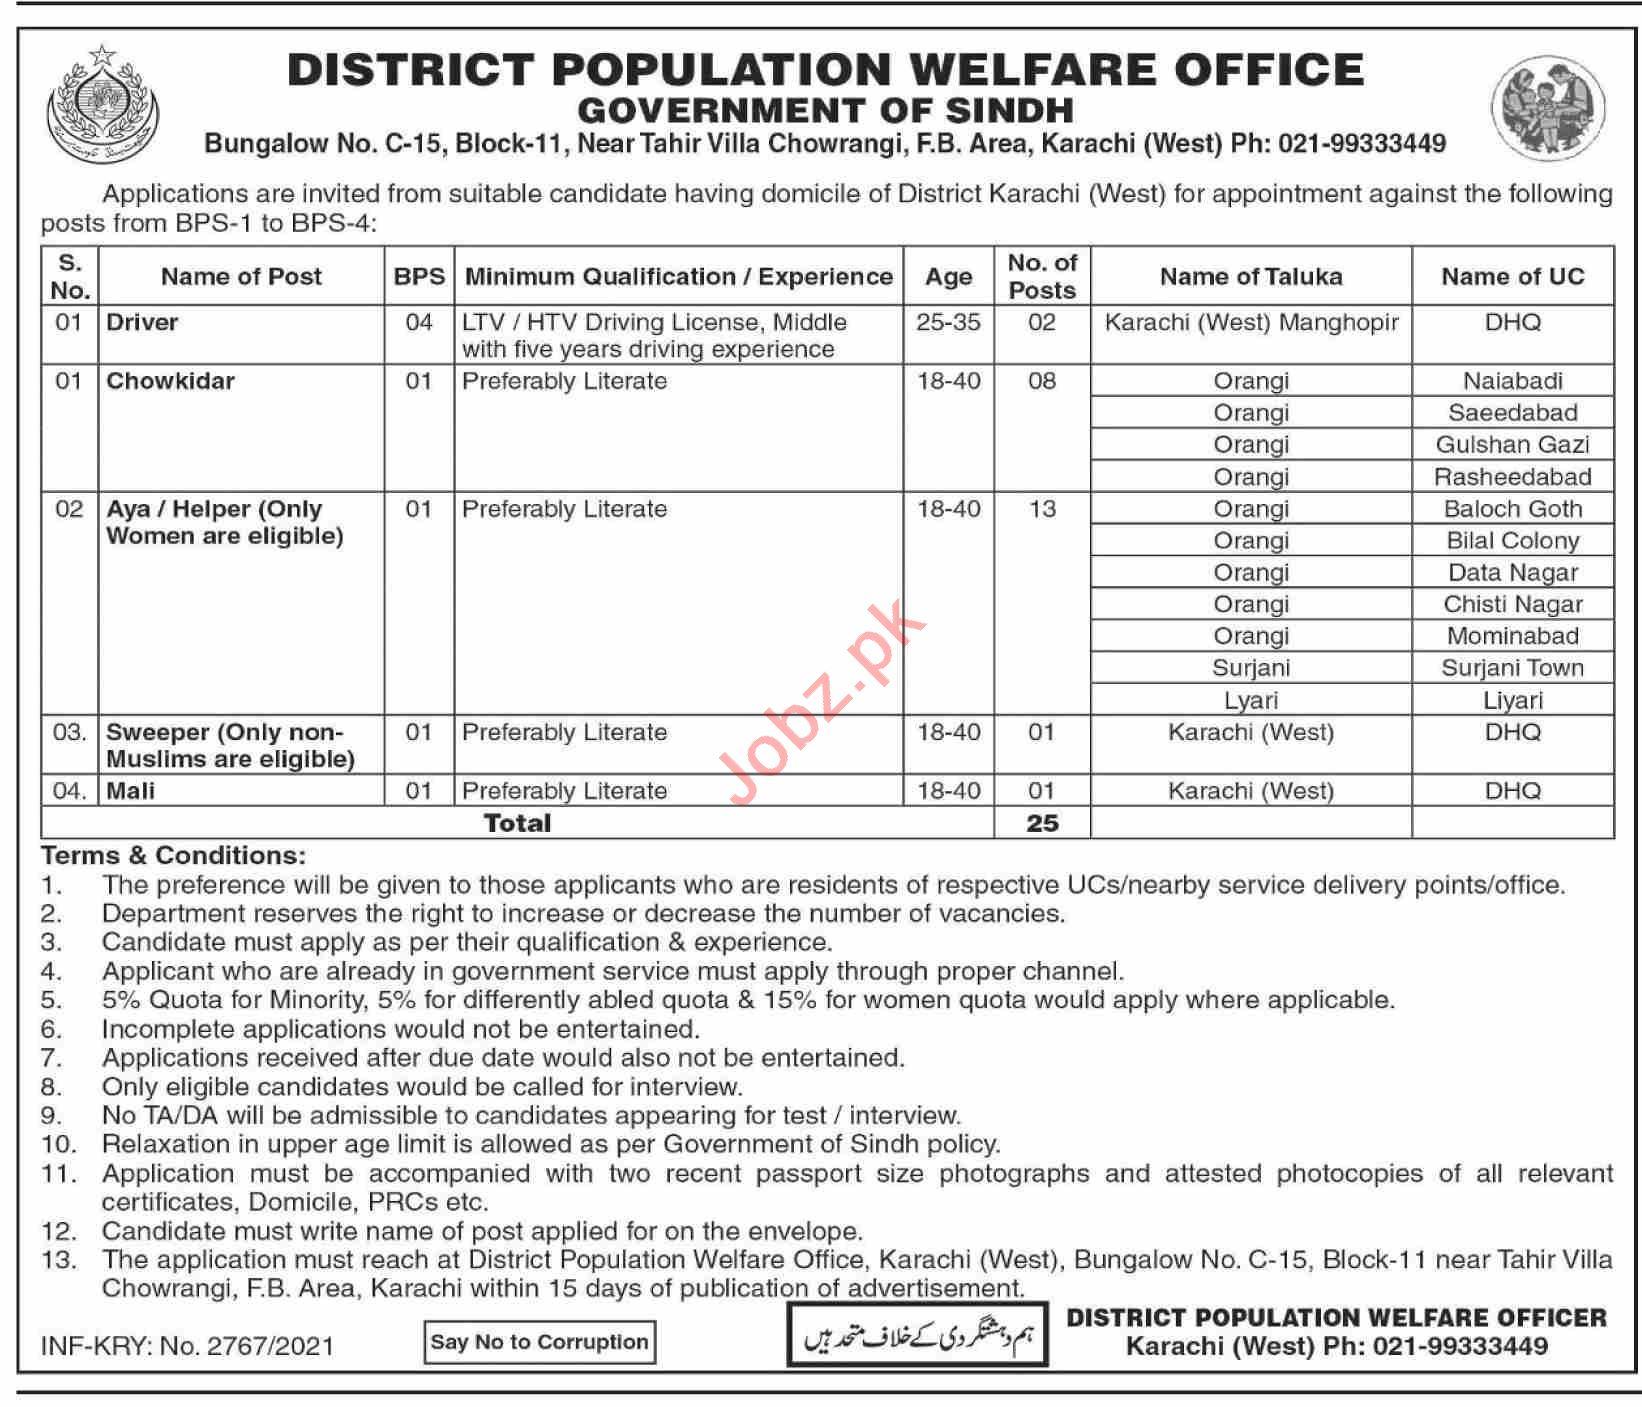 District Population Welfare Office West Karachi Jobs 2021